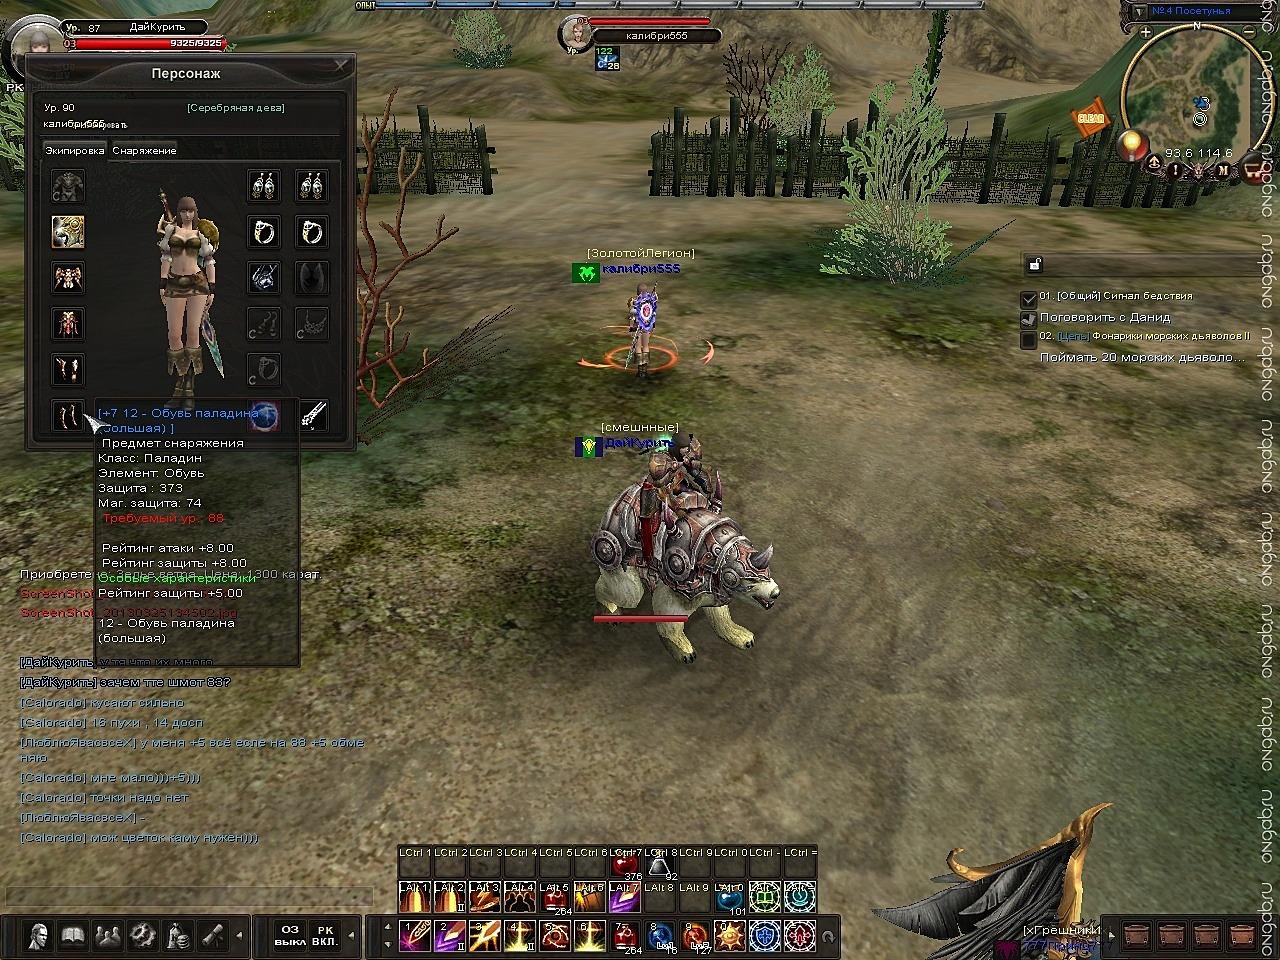 Скриншот Карос: Начало #170455